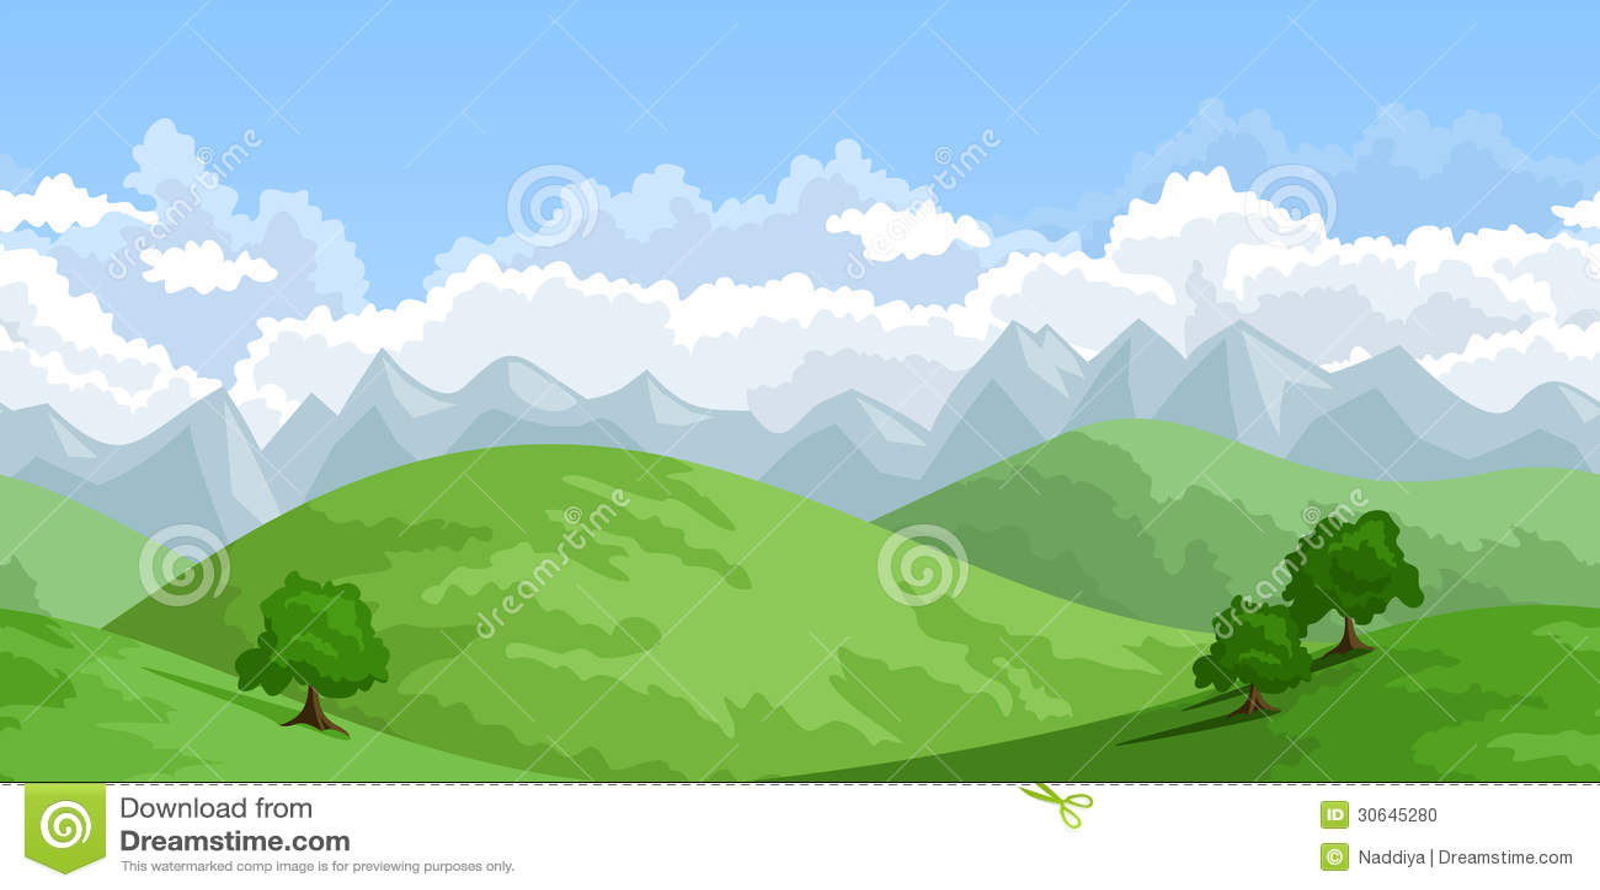 Landscape Illustration Vector Free: Vector Horizontal Seamless Summer Landscape. Stock Vector